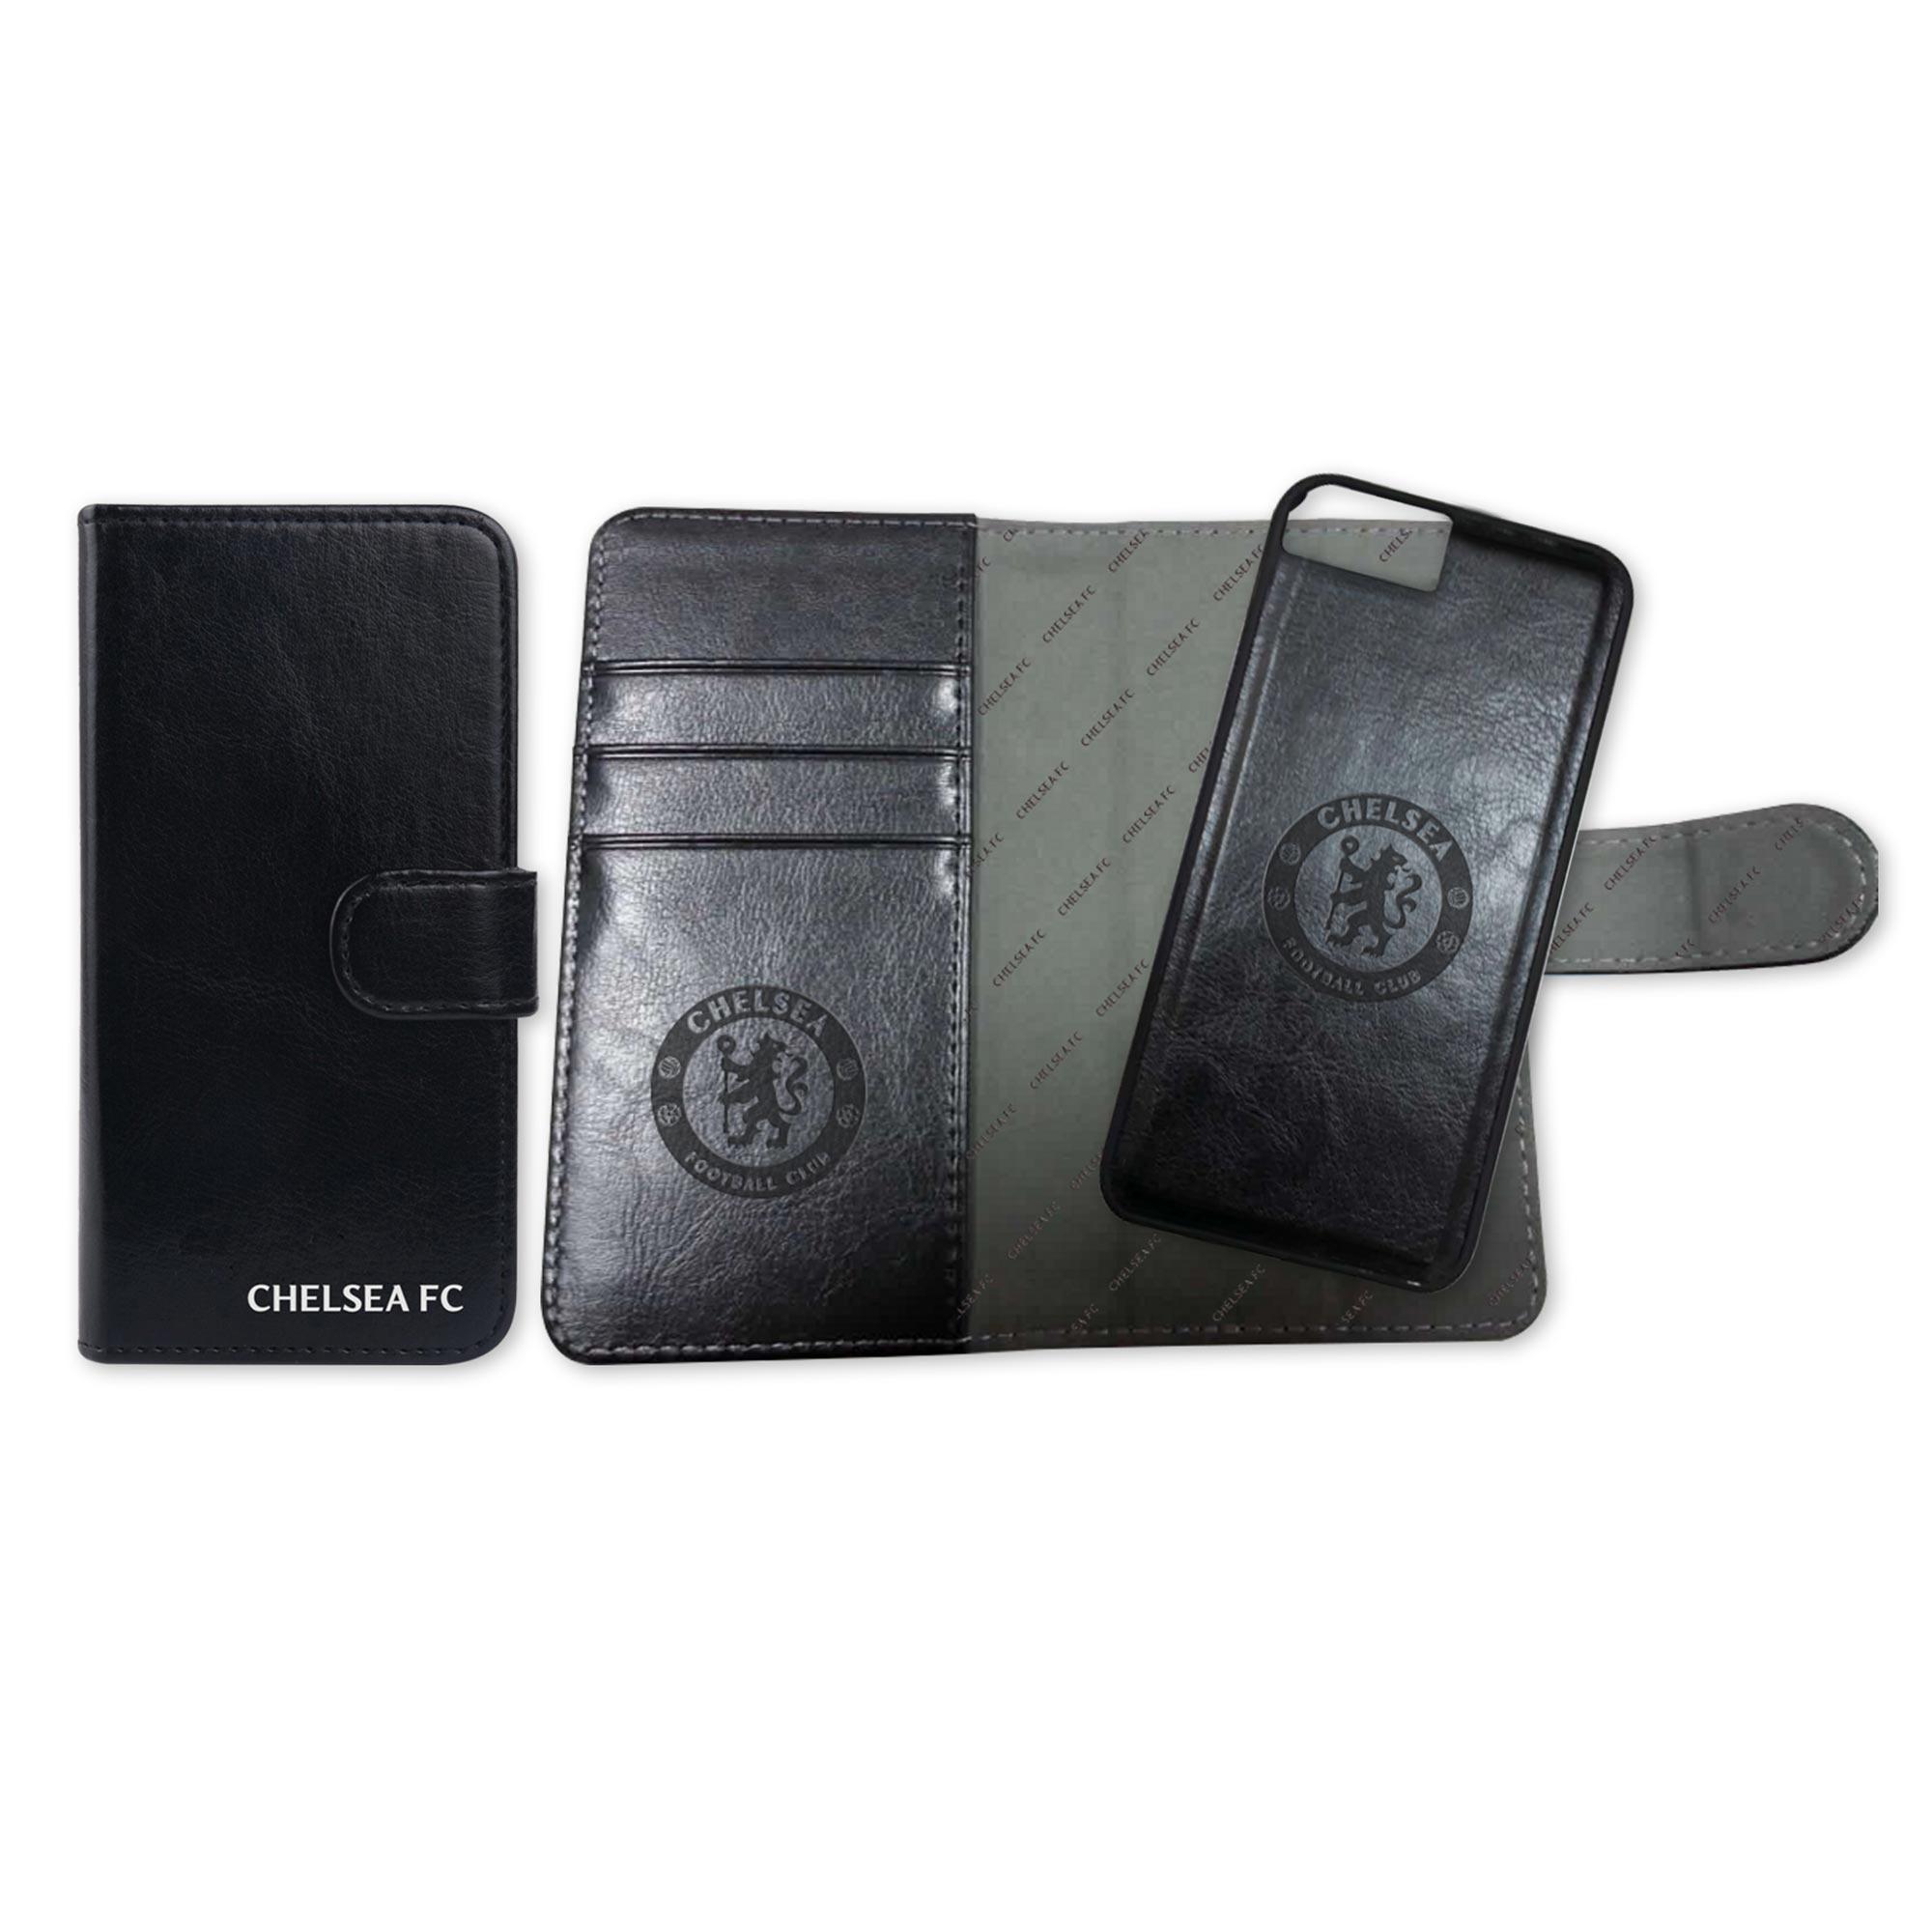 Chelsea 2 in 1 Detachable iPhone 7 Case